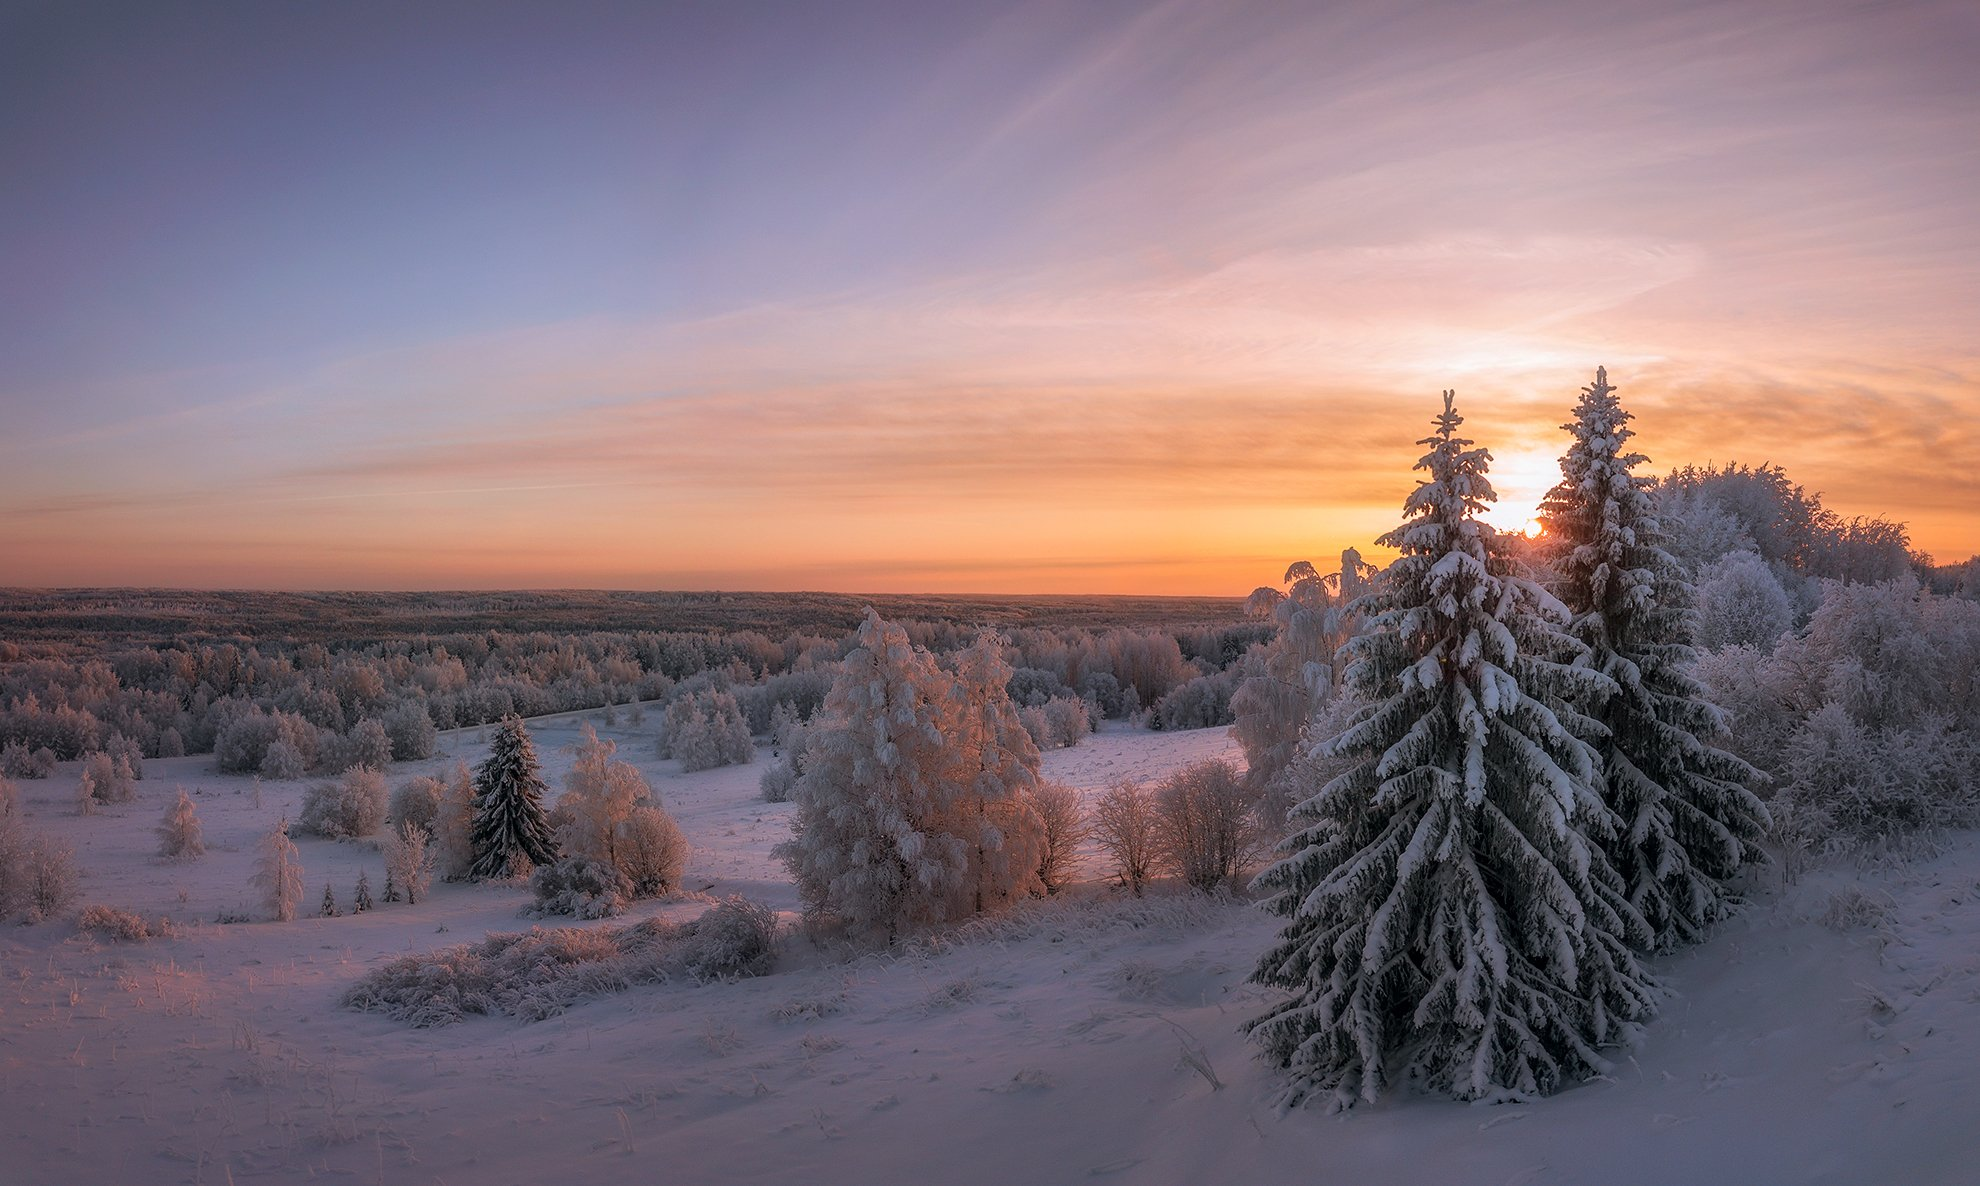 drone photo,sunset,dji,mavic pro,закат,зима,деревня,верхняя тойма,архангельская область,зимний лес, Алексей Юницын